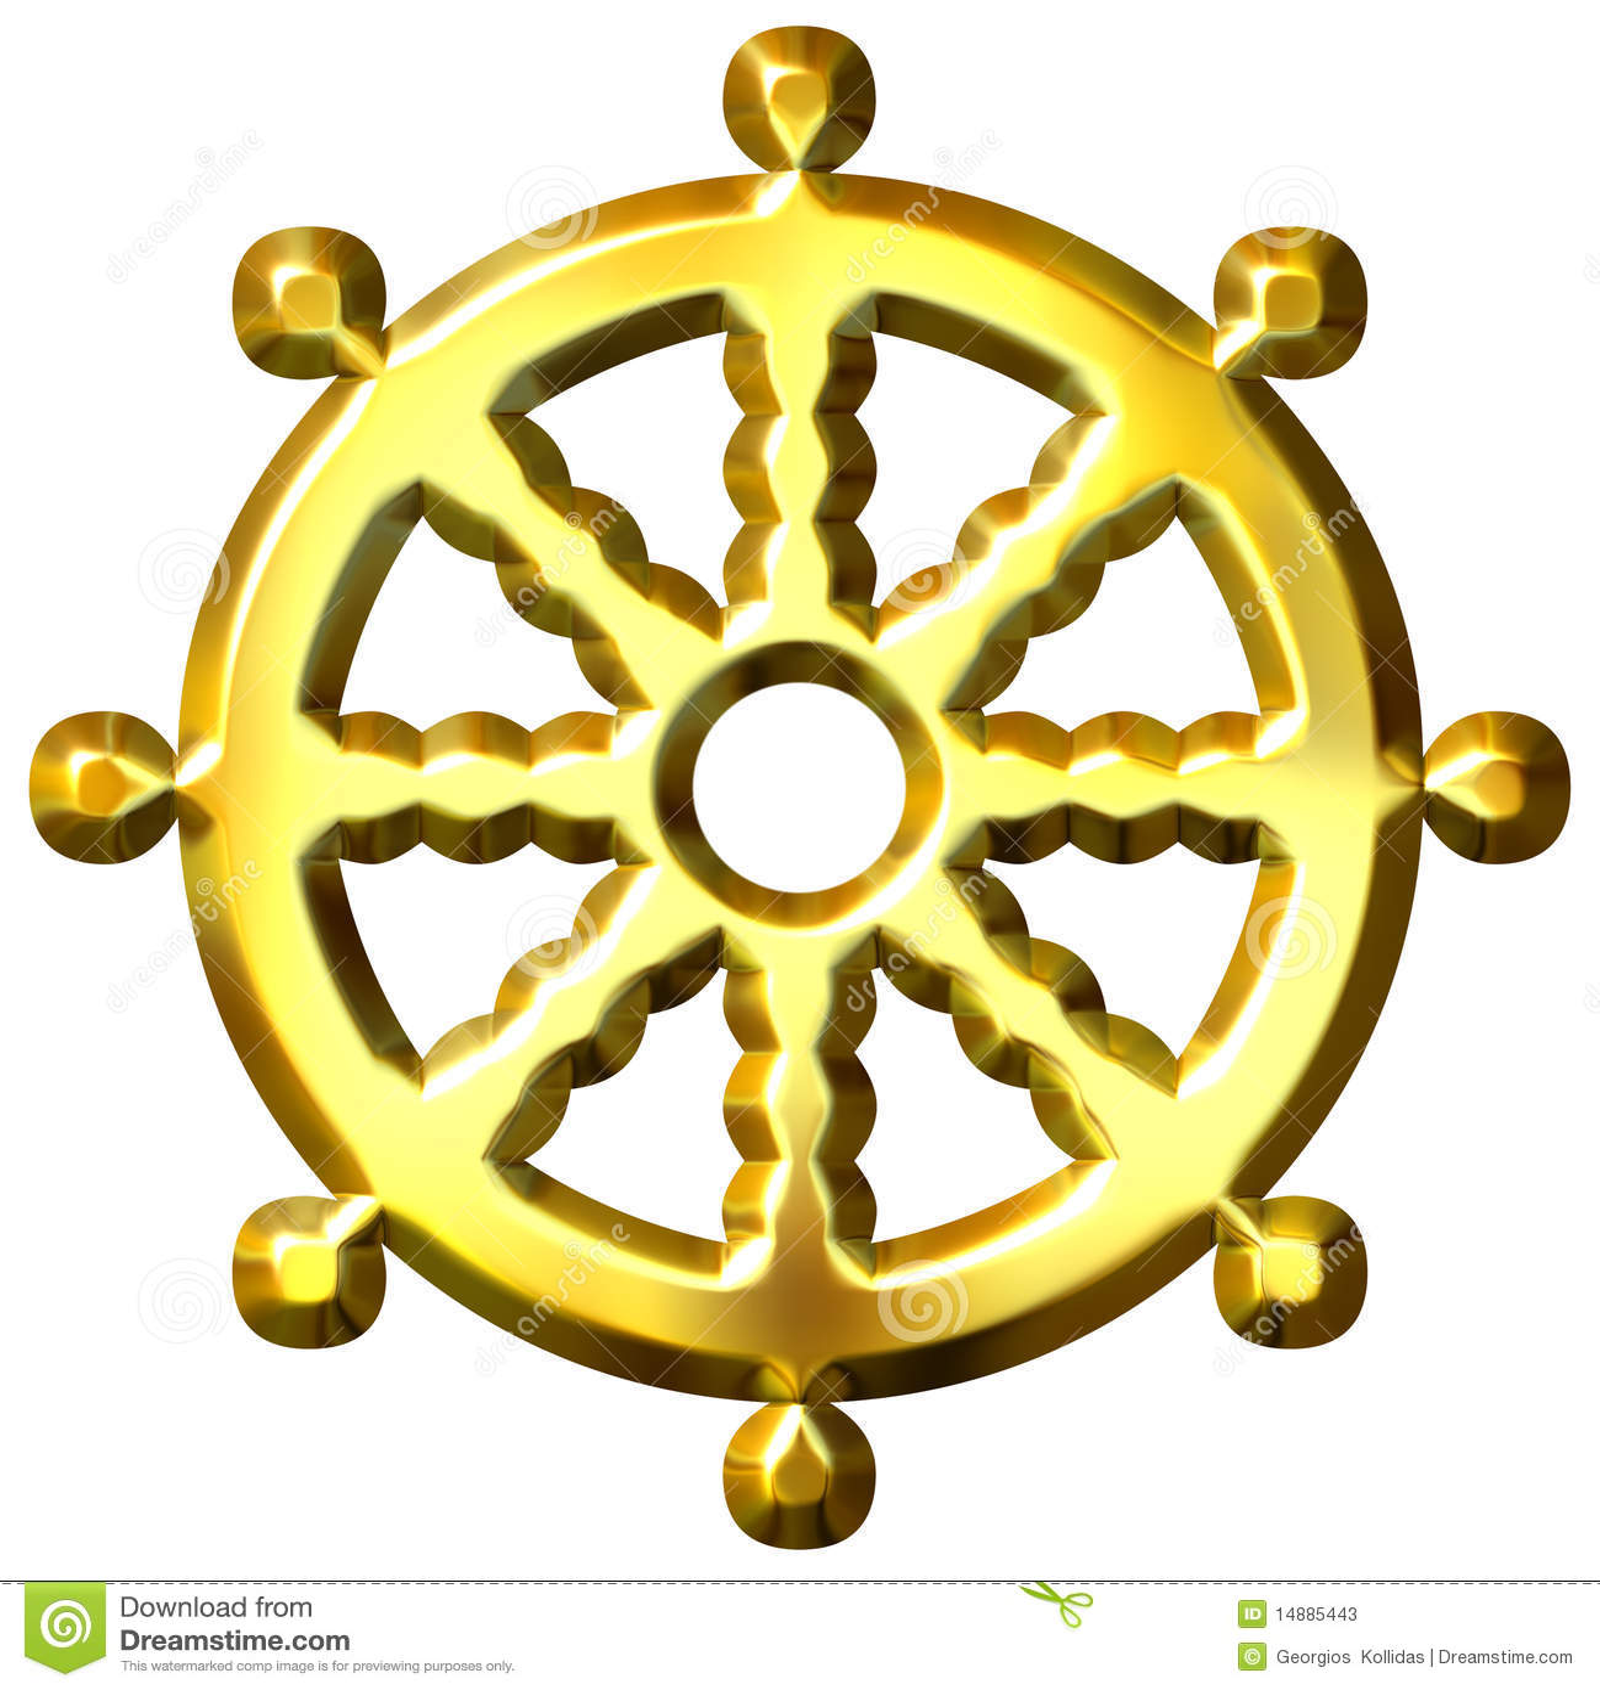 goldenes symbol rad des buddhismus 3d von dharma stock abbildung illustration 14885443. Black Bedroom Furniture Sets. Home Design Ideas